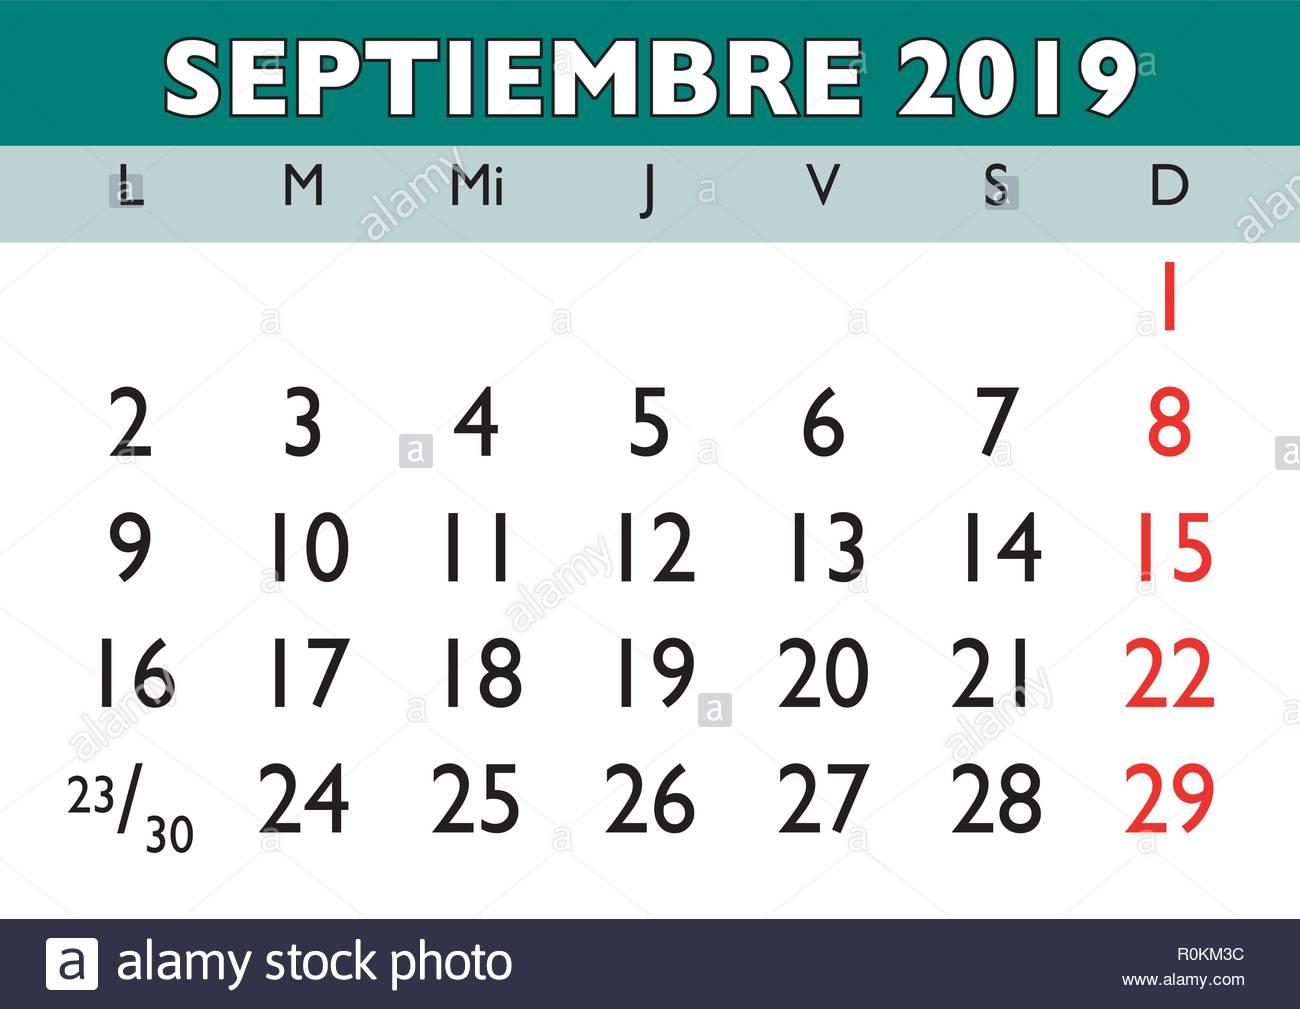 Calendario Vectores.September Month In A Year 2019 Wall Calendar In Spanish